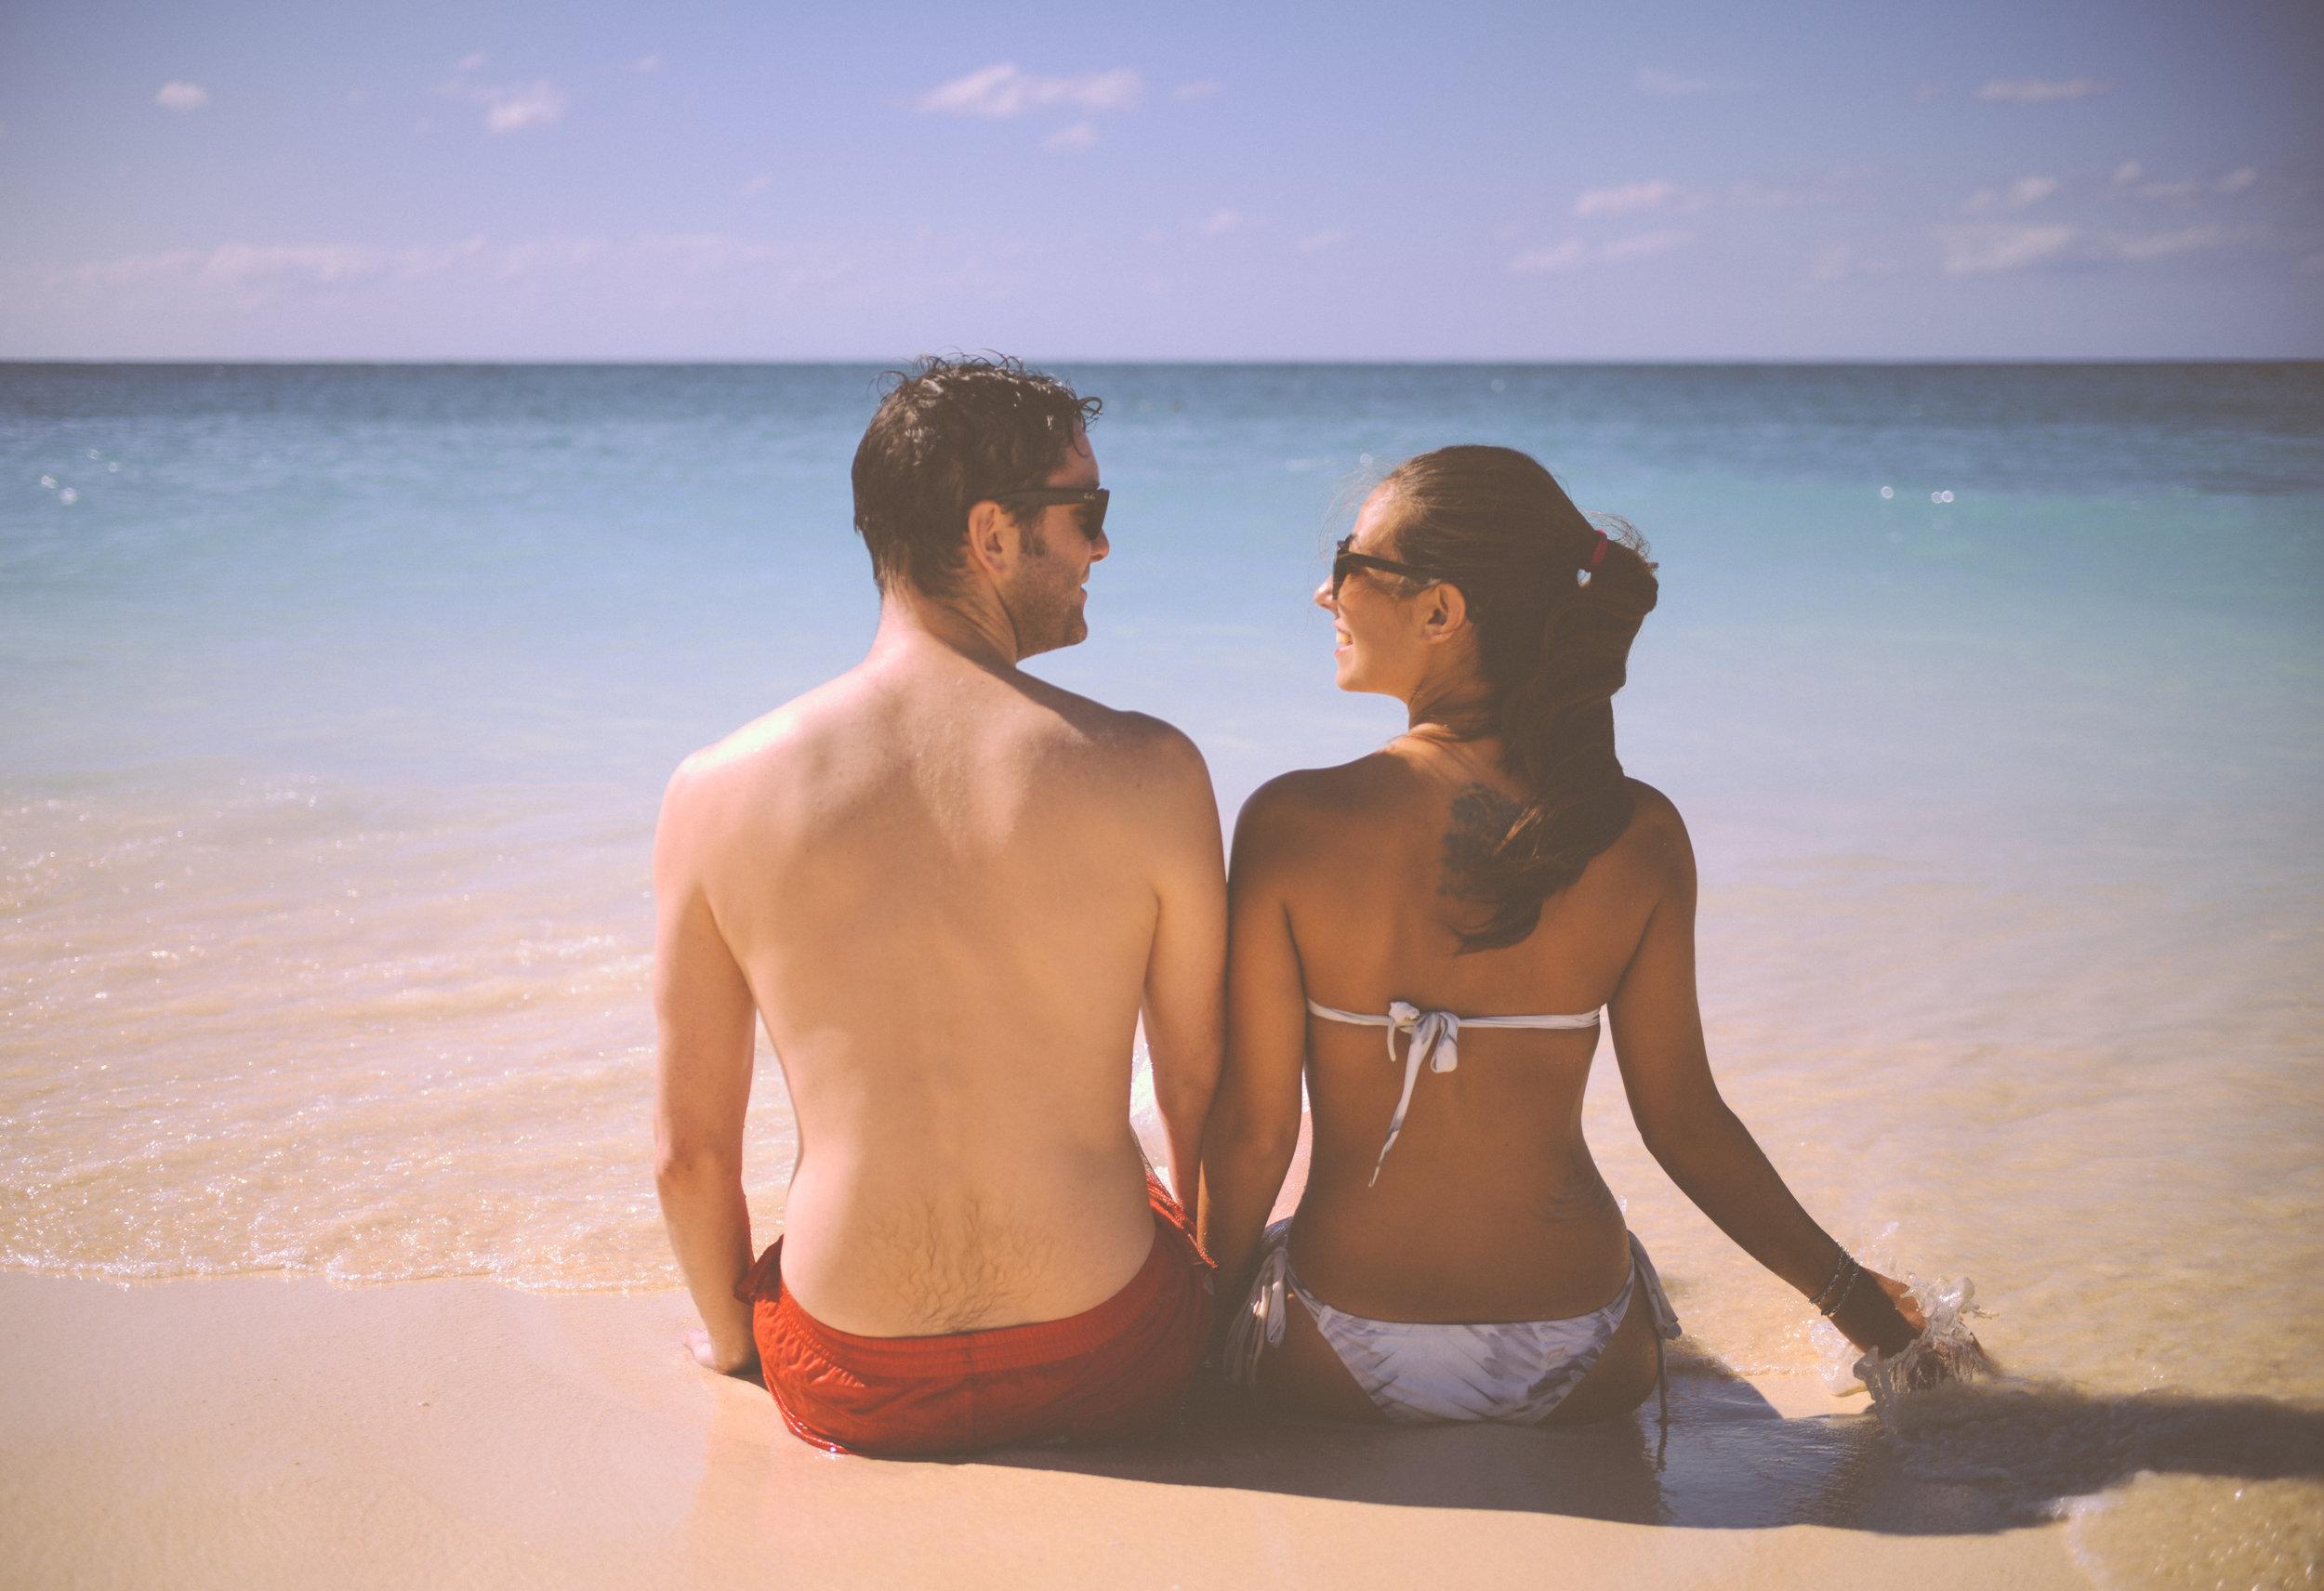 man-beach-sea-sand-ocean-woman-936818-pxhere.com.jpg